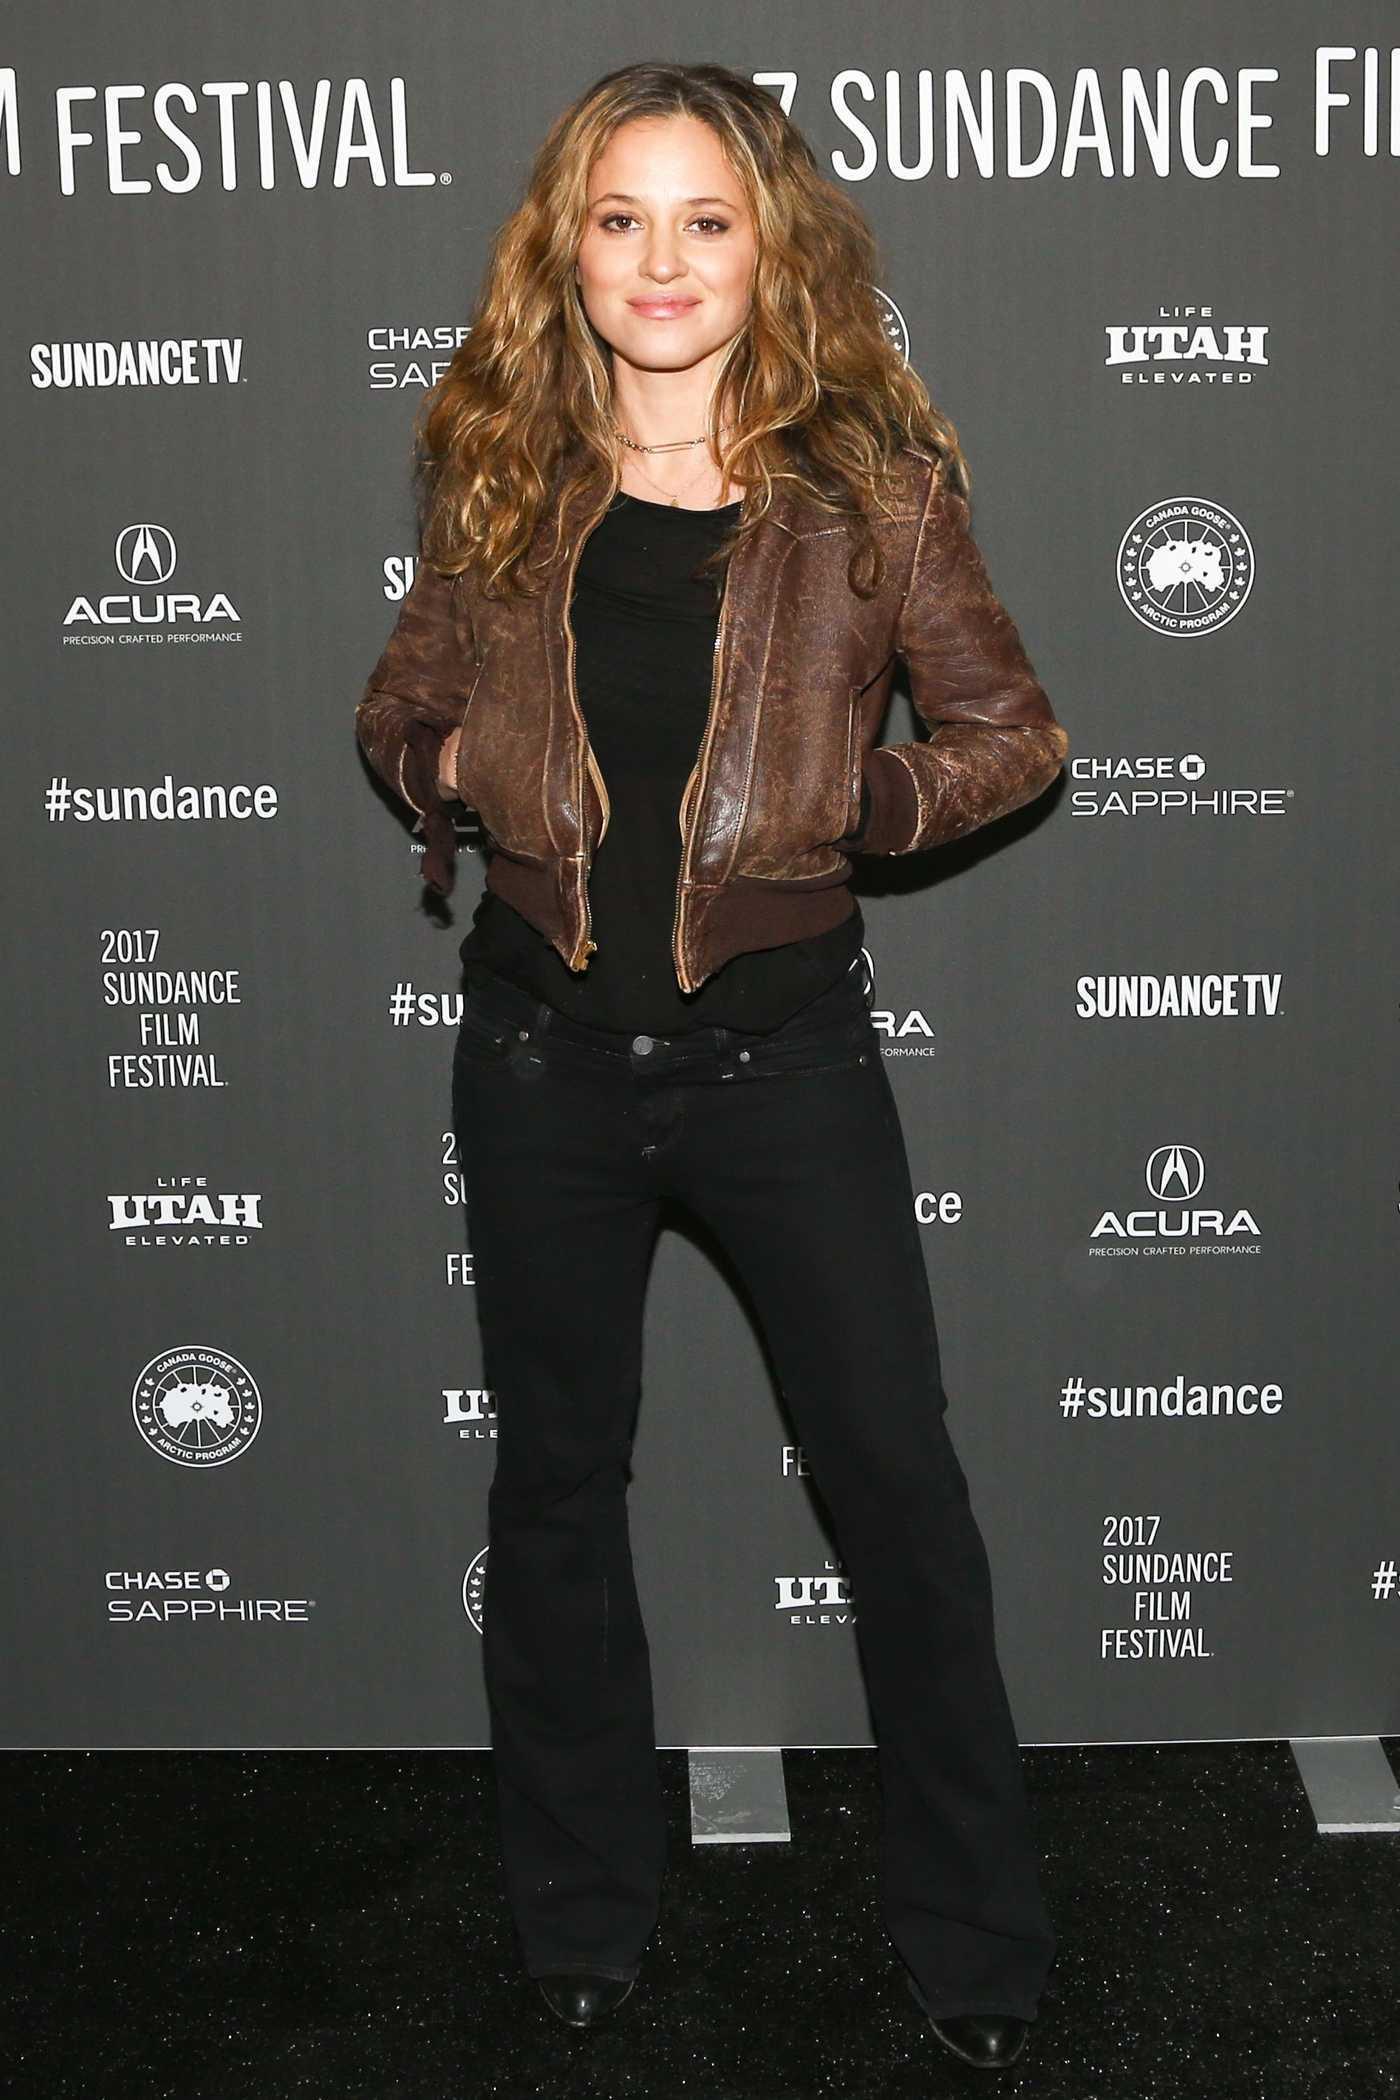 Margarita Levieva at LA Times Premiere During Sundance Film Festival 01/20/2017